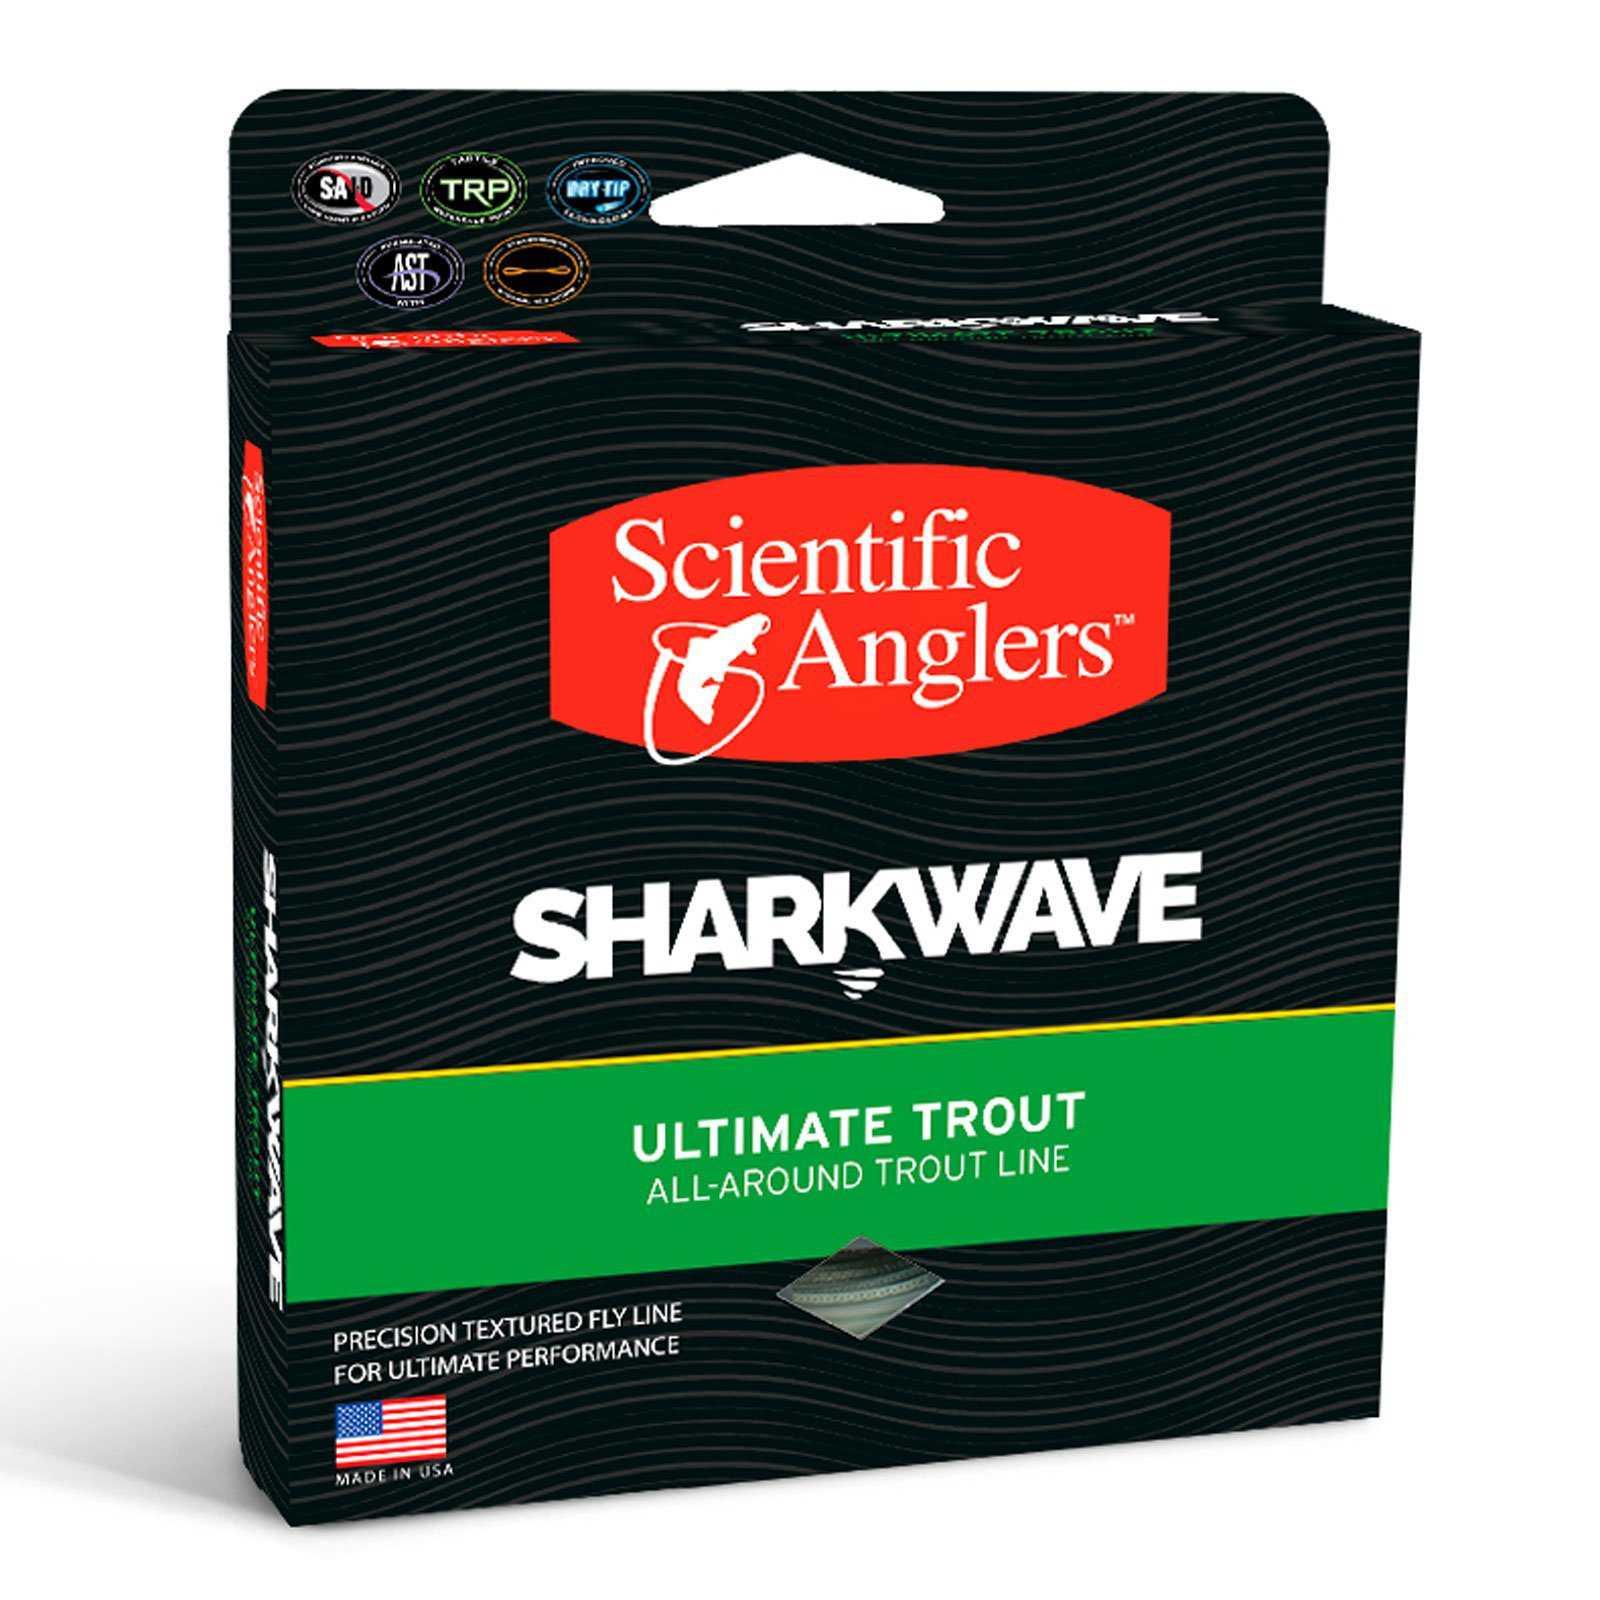 Scientific Anglers Sharkwave